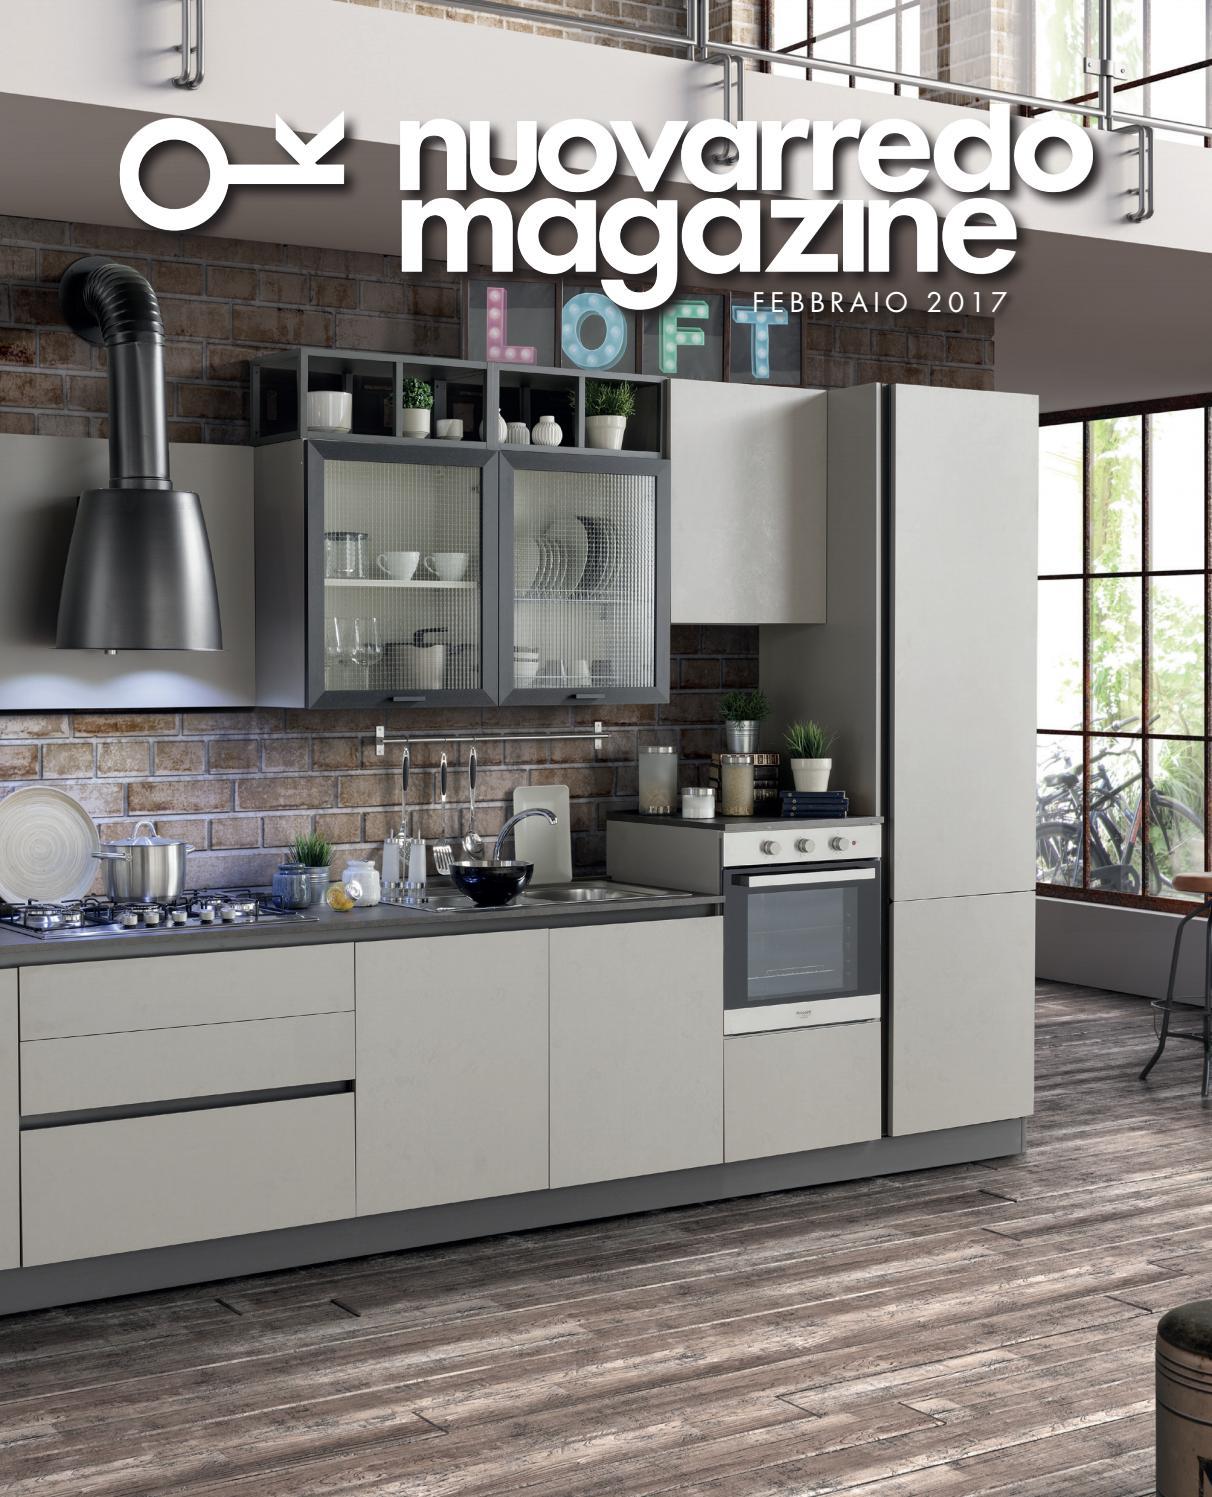 Nuovarredo Magazine Febbraio 2017 by Nuovarredo - issuu